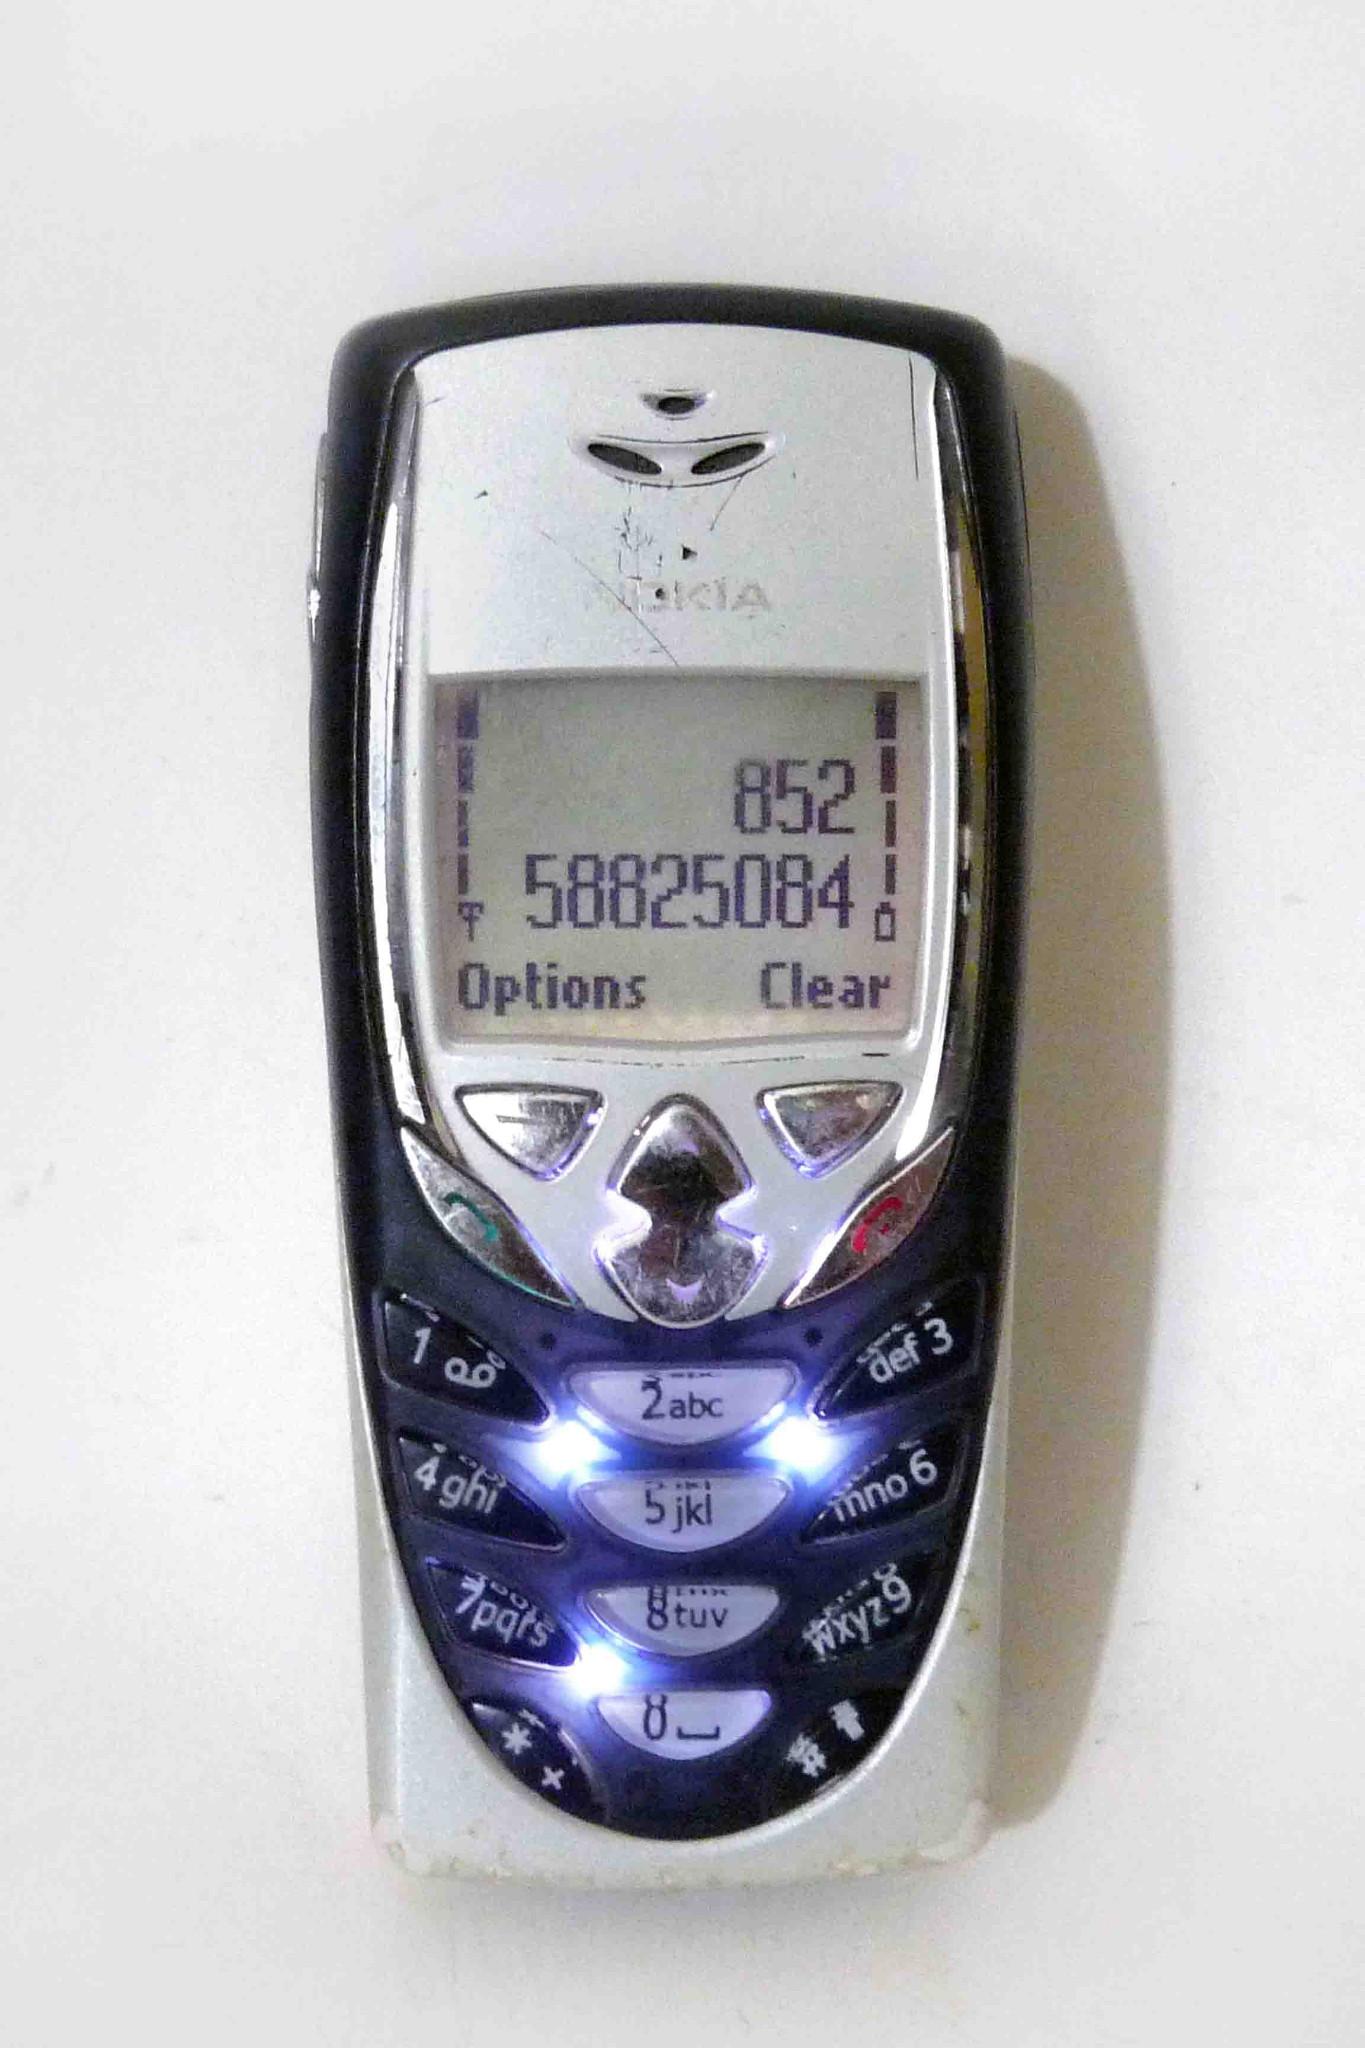 Nokia 8310 ke7